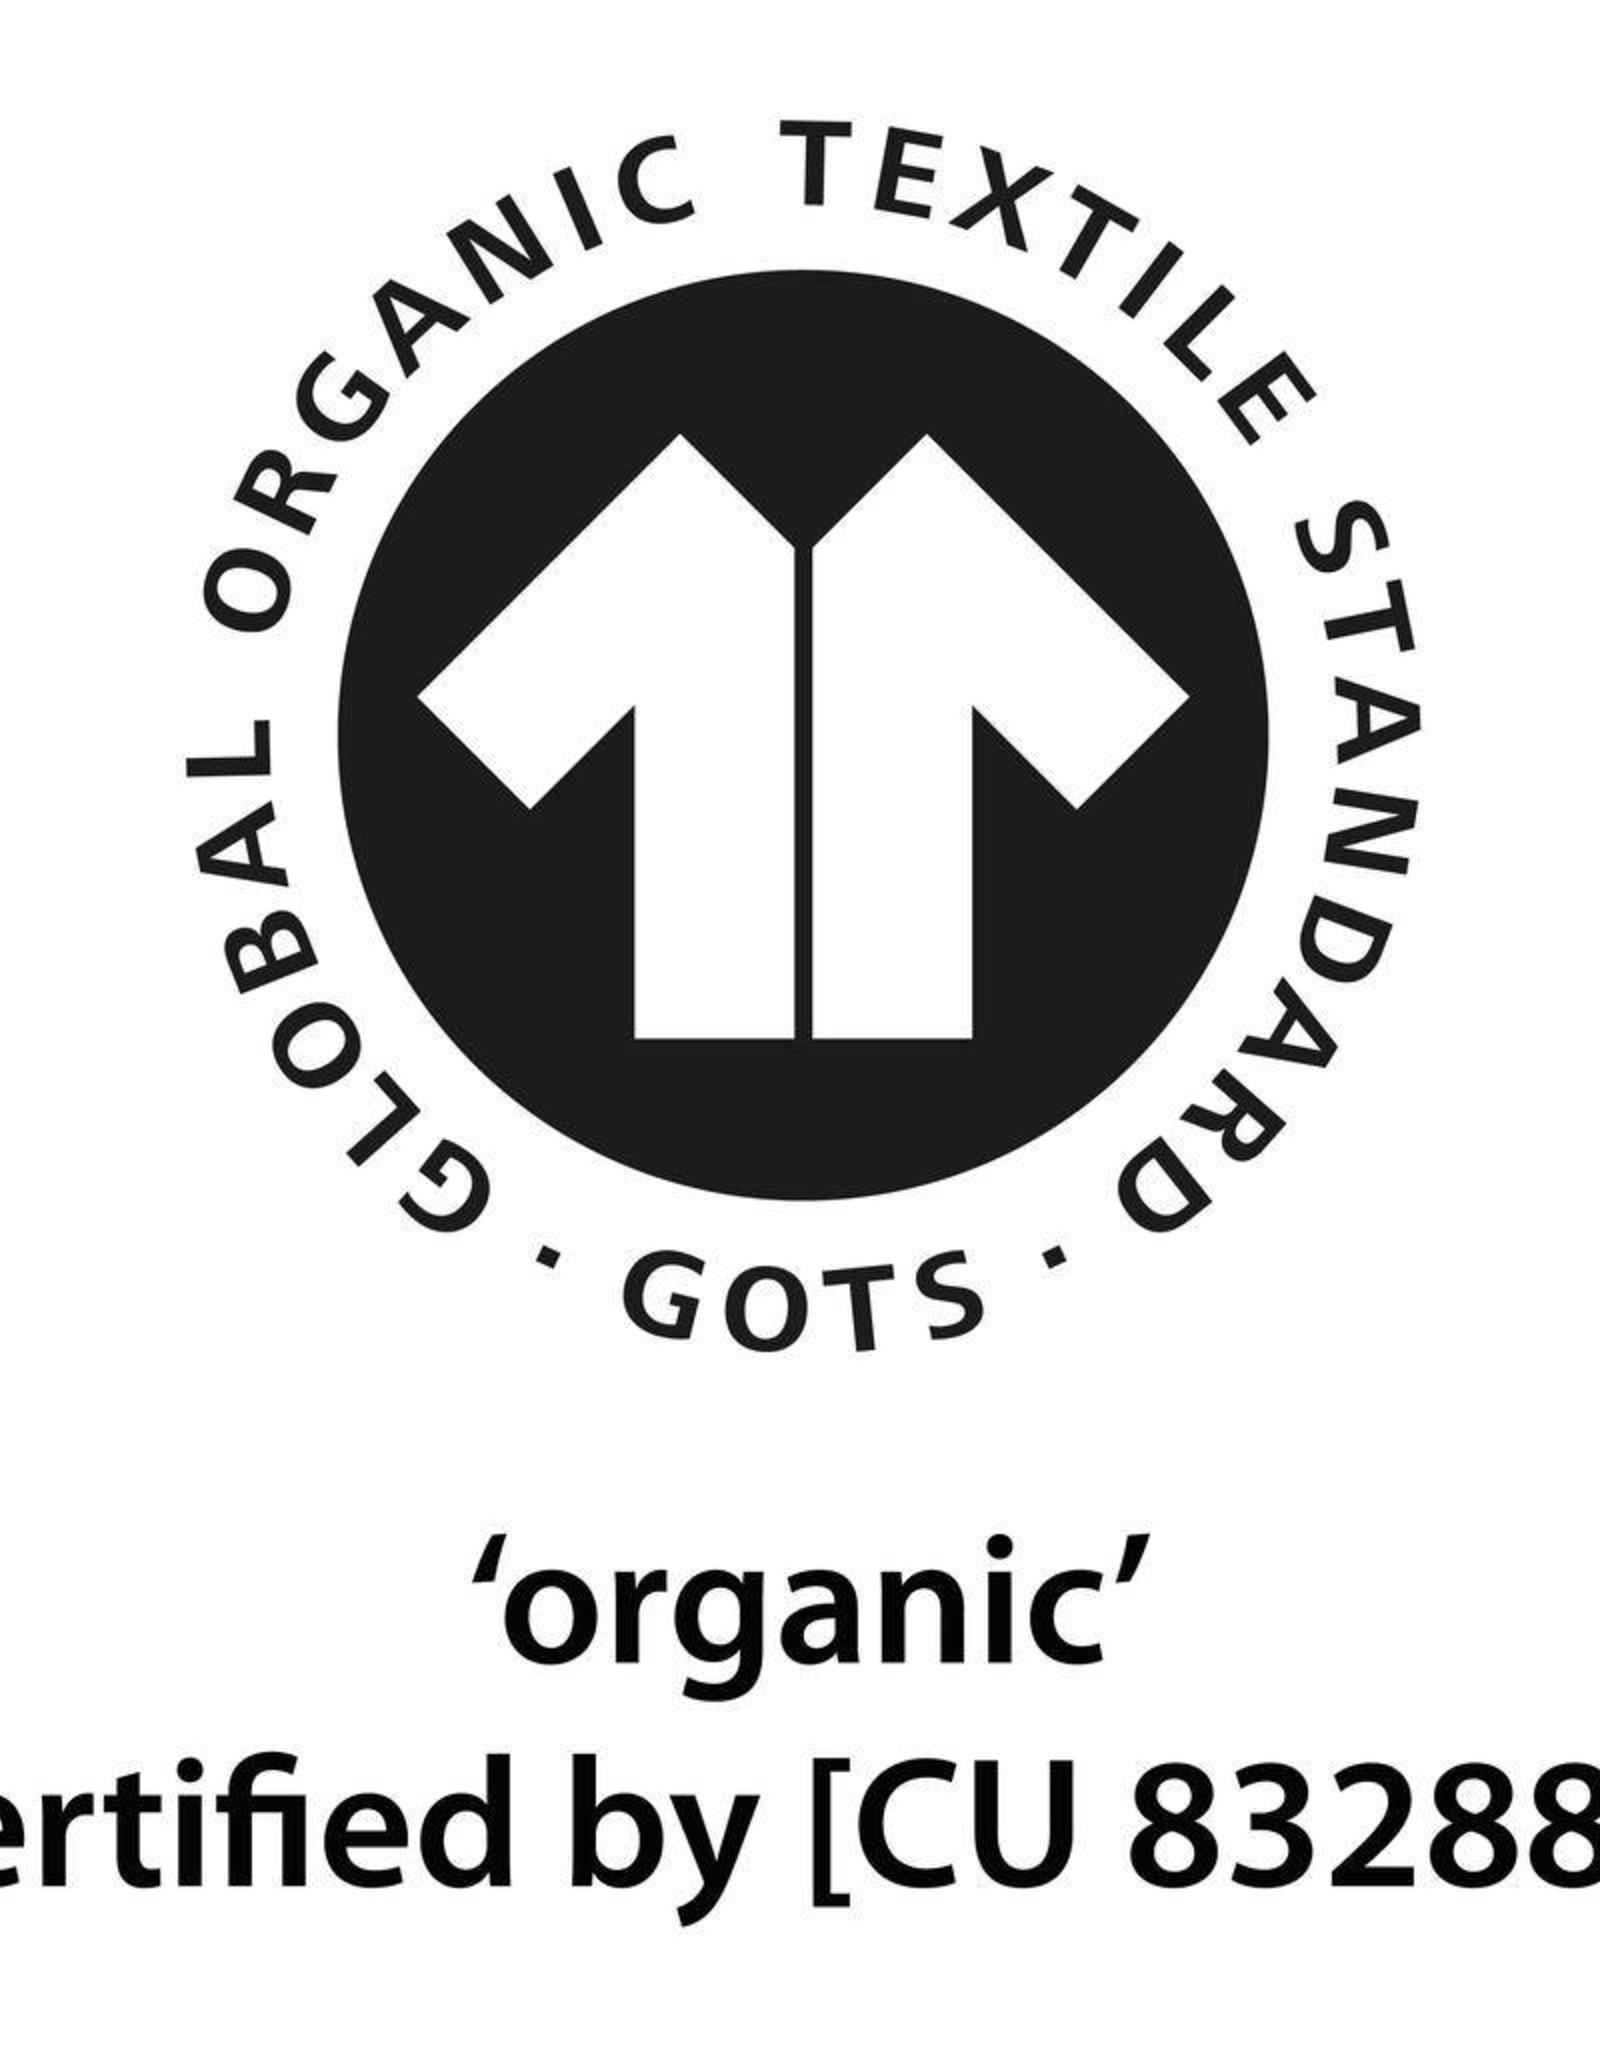 GOTS Global Organic Textile Standard